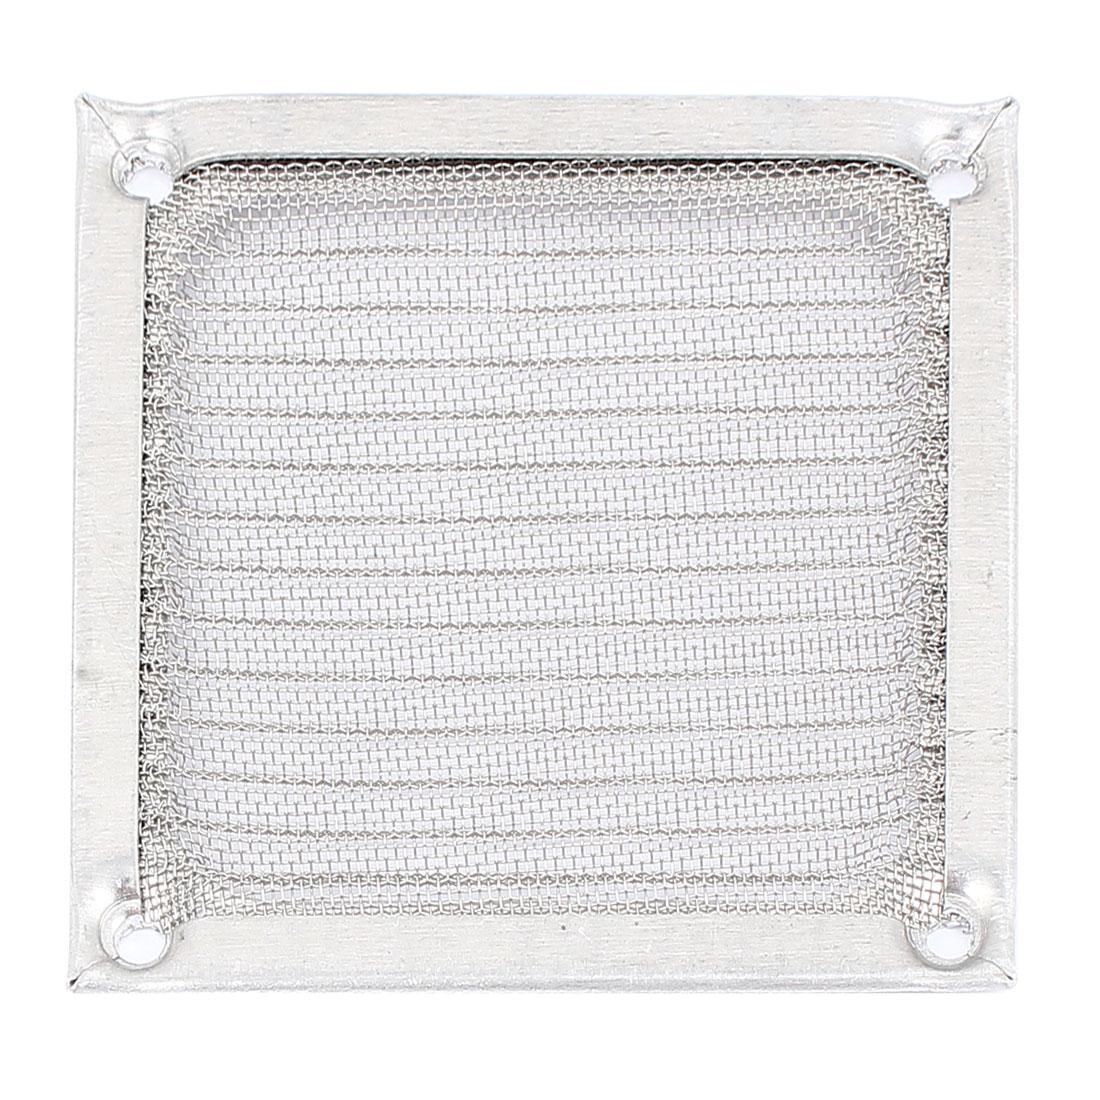 Aluminum Dustproof Mesh Filter Guard for PC Computer Case 85mm Cooling Fan